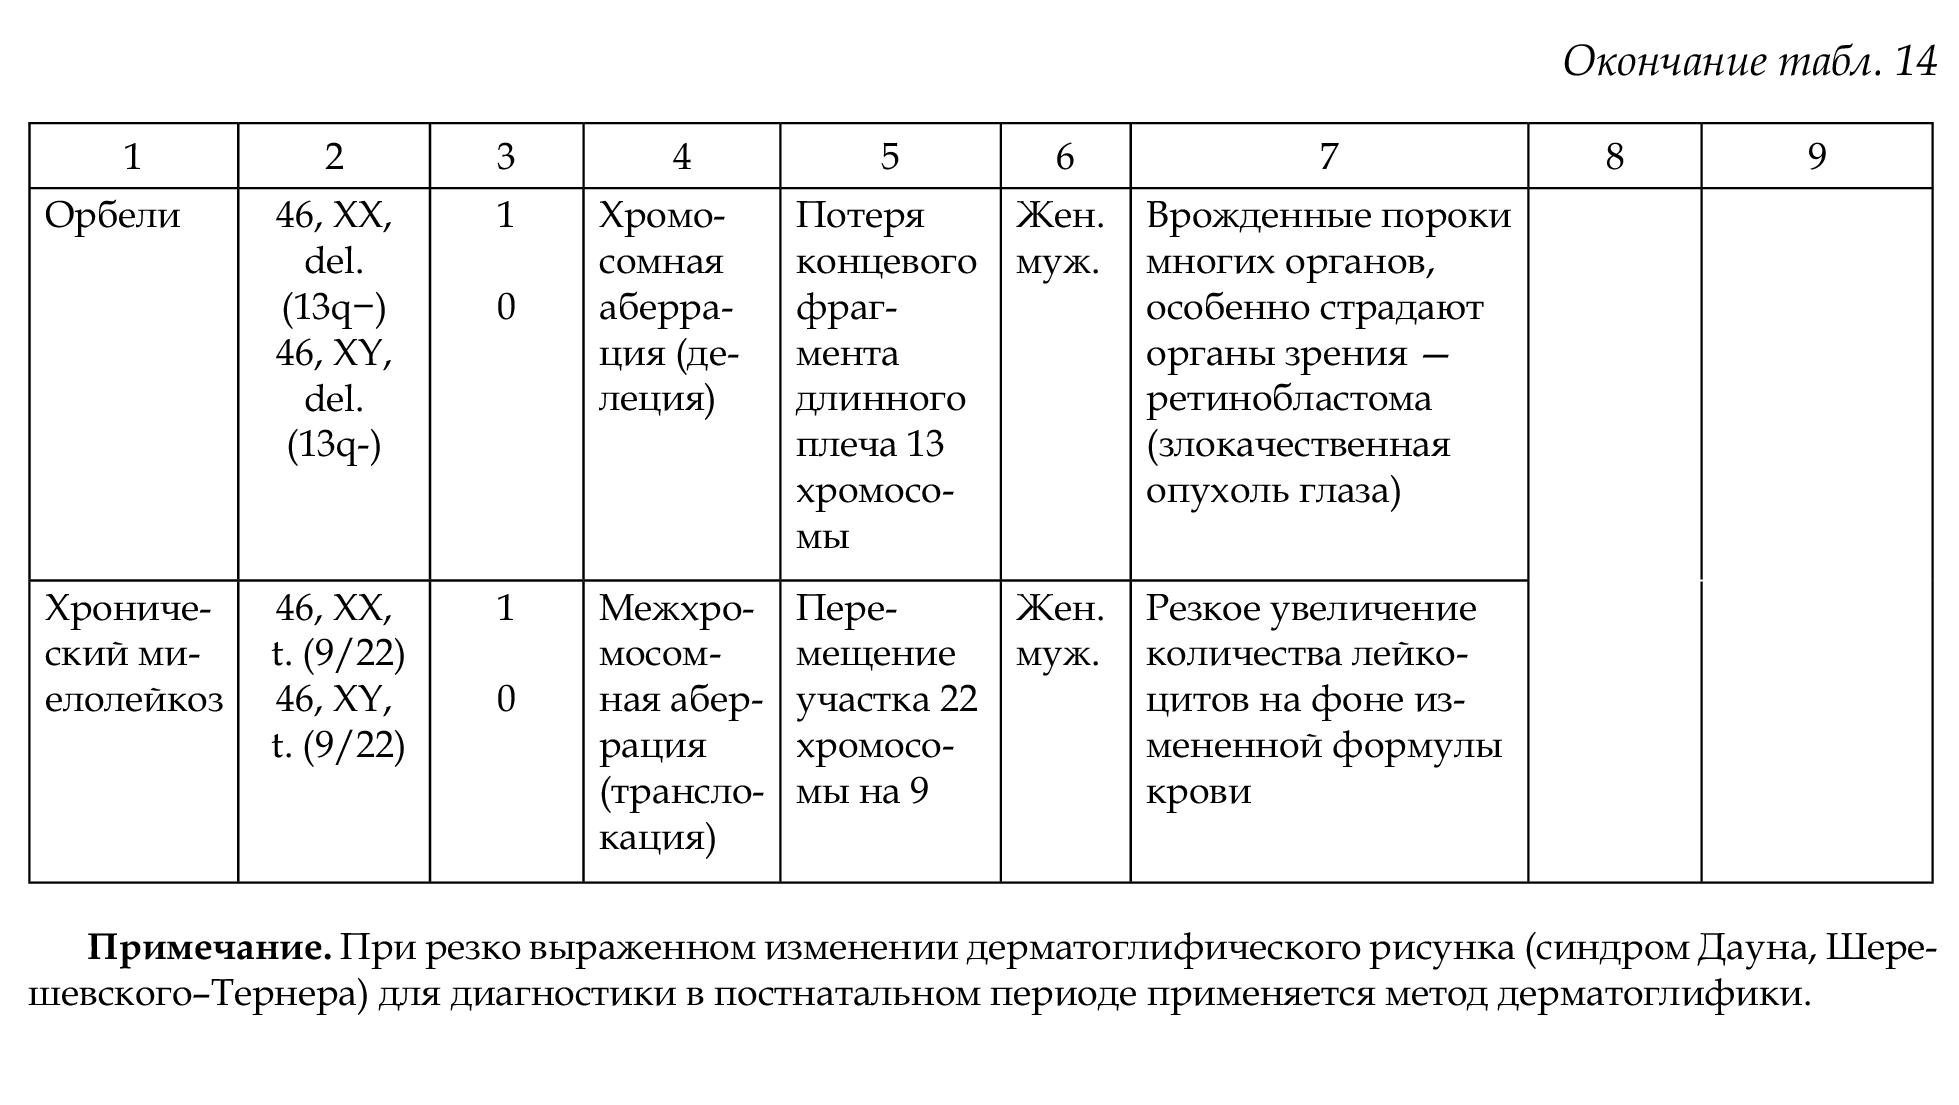 Анализ кариограммы и описание кариотипа человека | Задачи 1-10 | 1105x1959